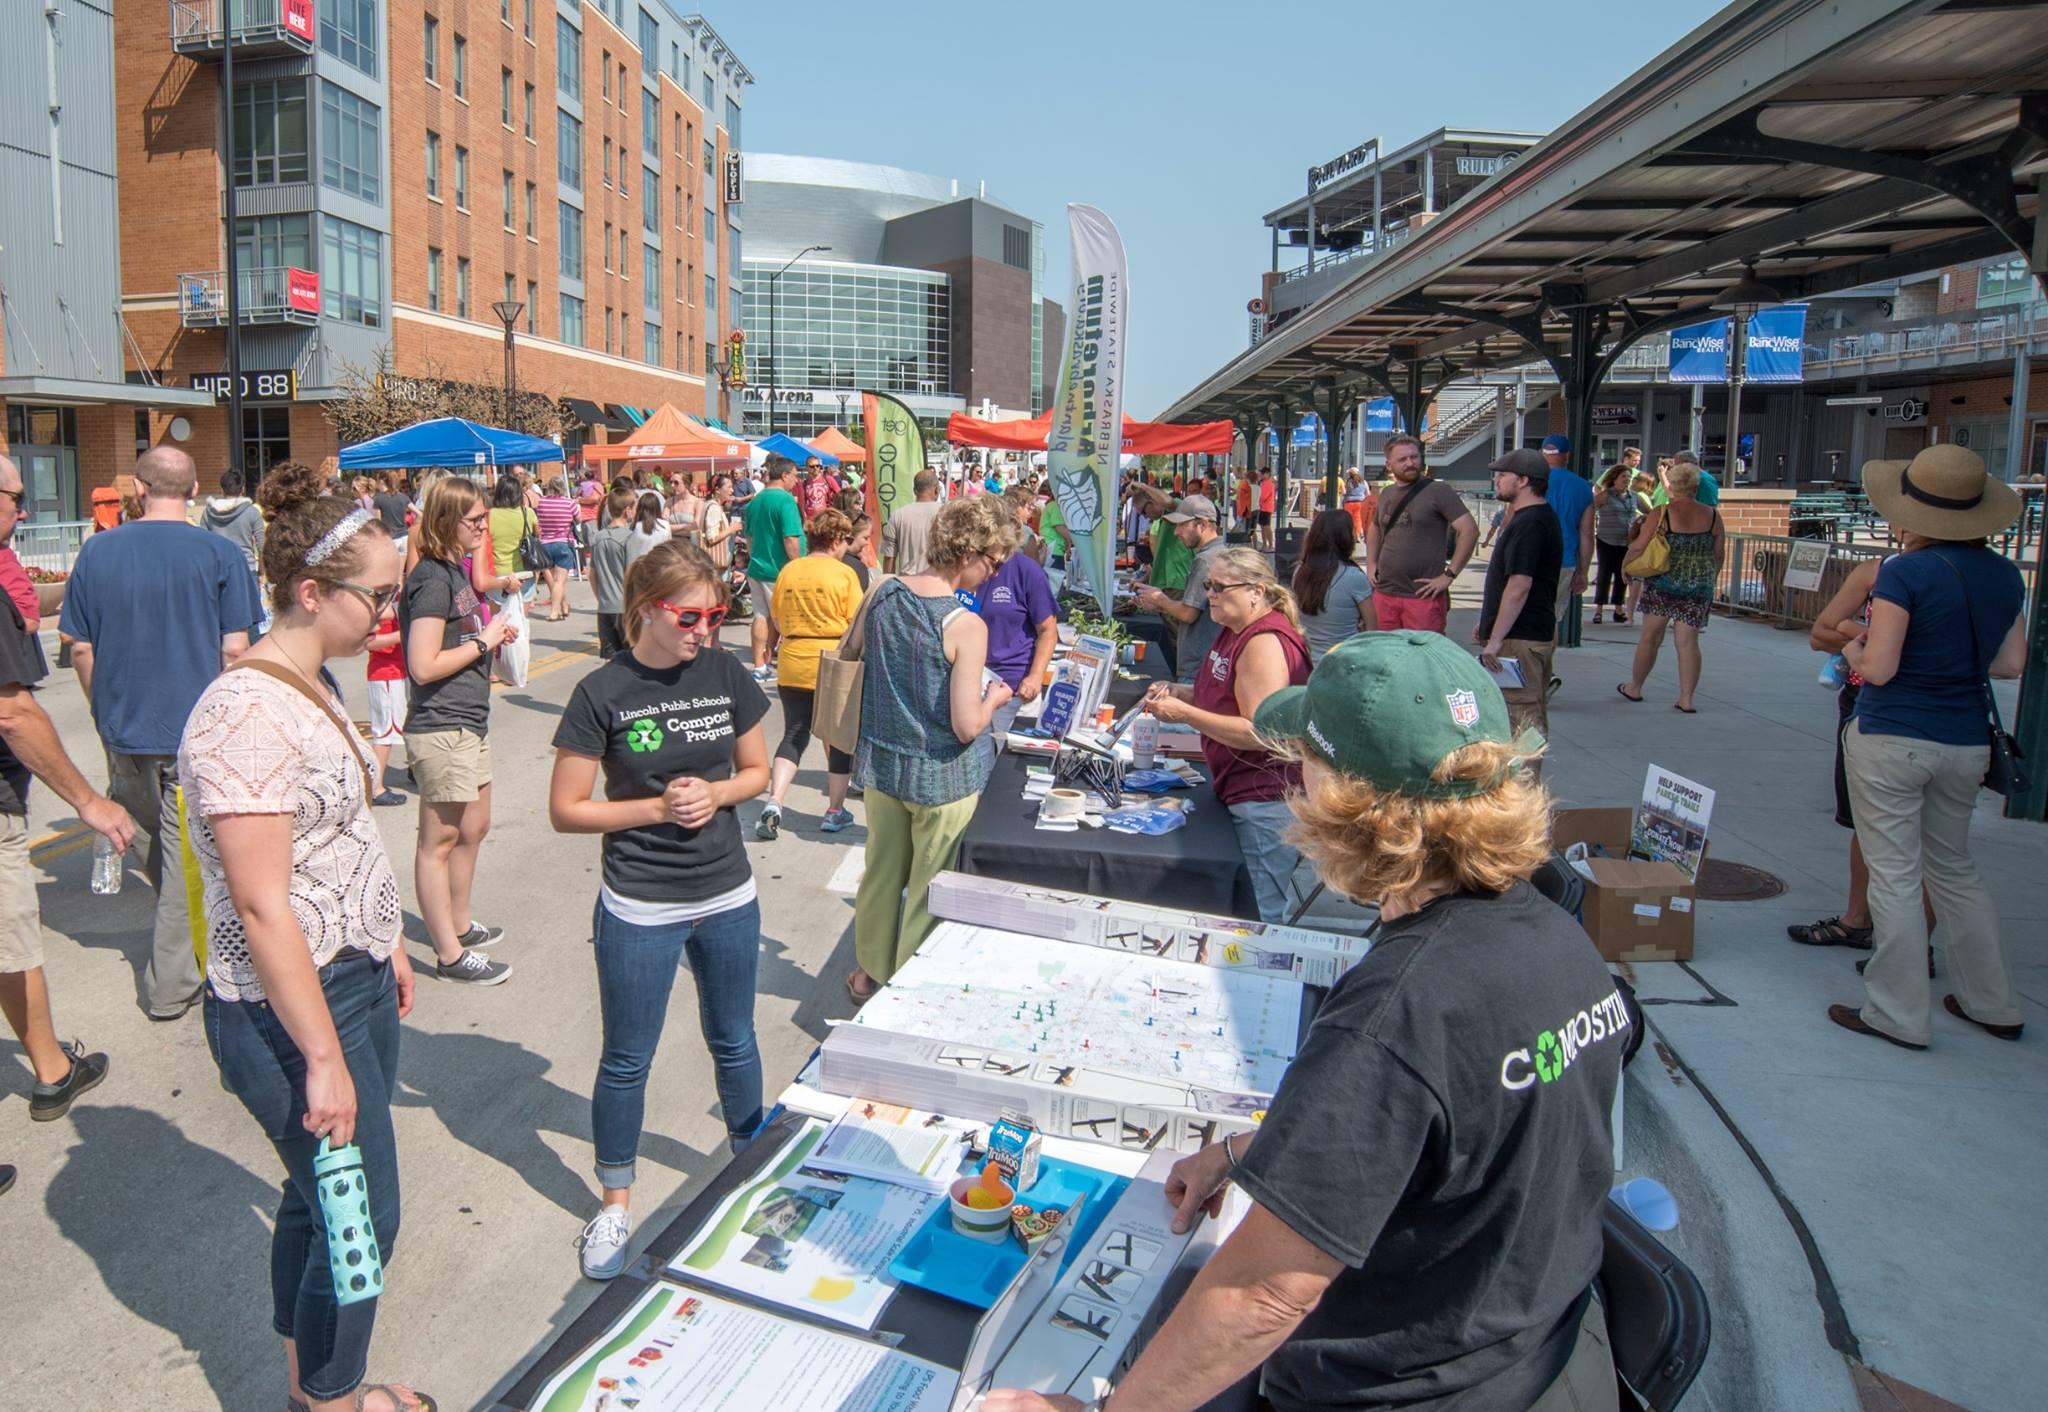 Cavalcade Of Customs >> LES Sustainable Living Festival 2020 in Lincoln, NE | Everfest